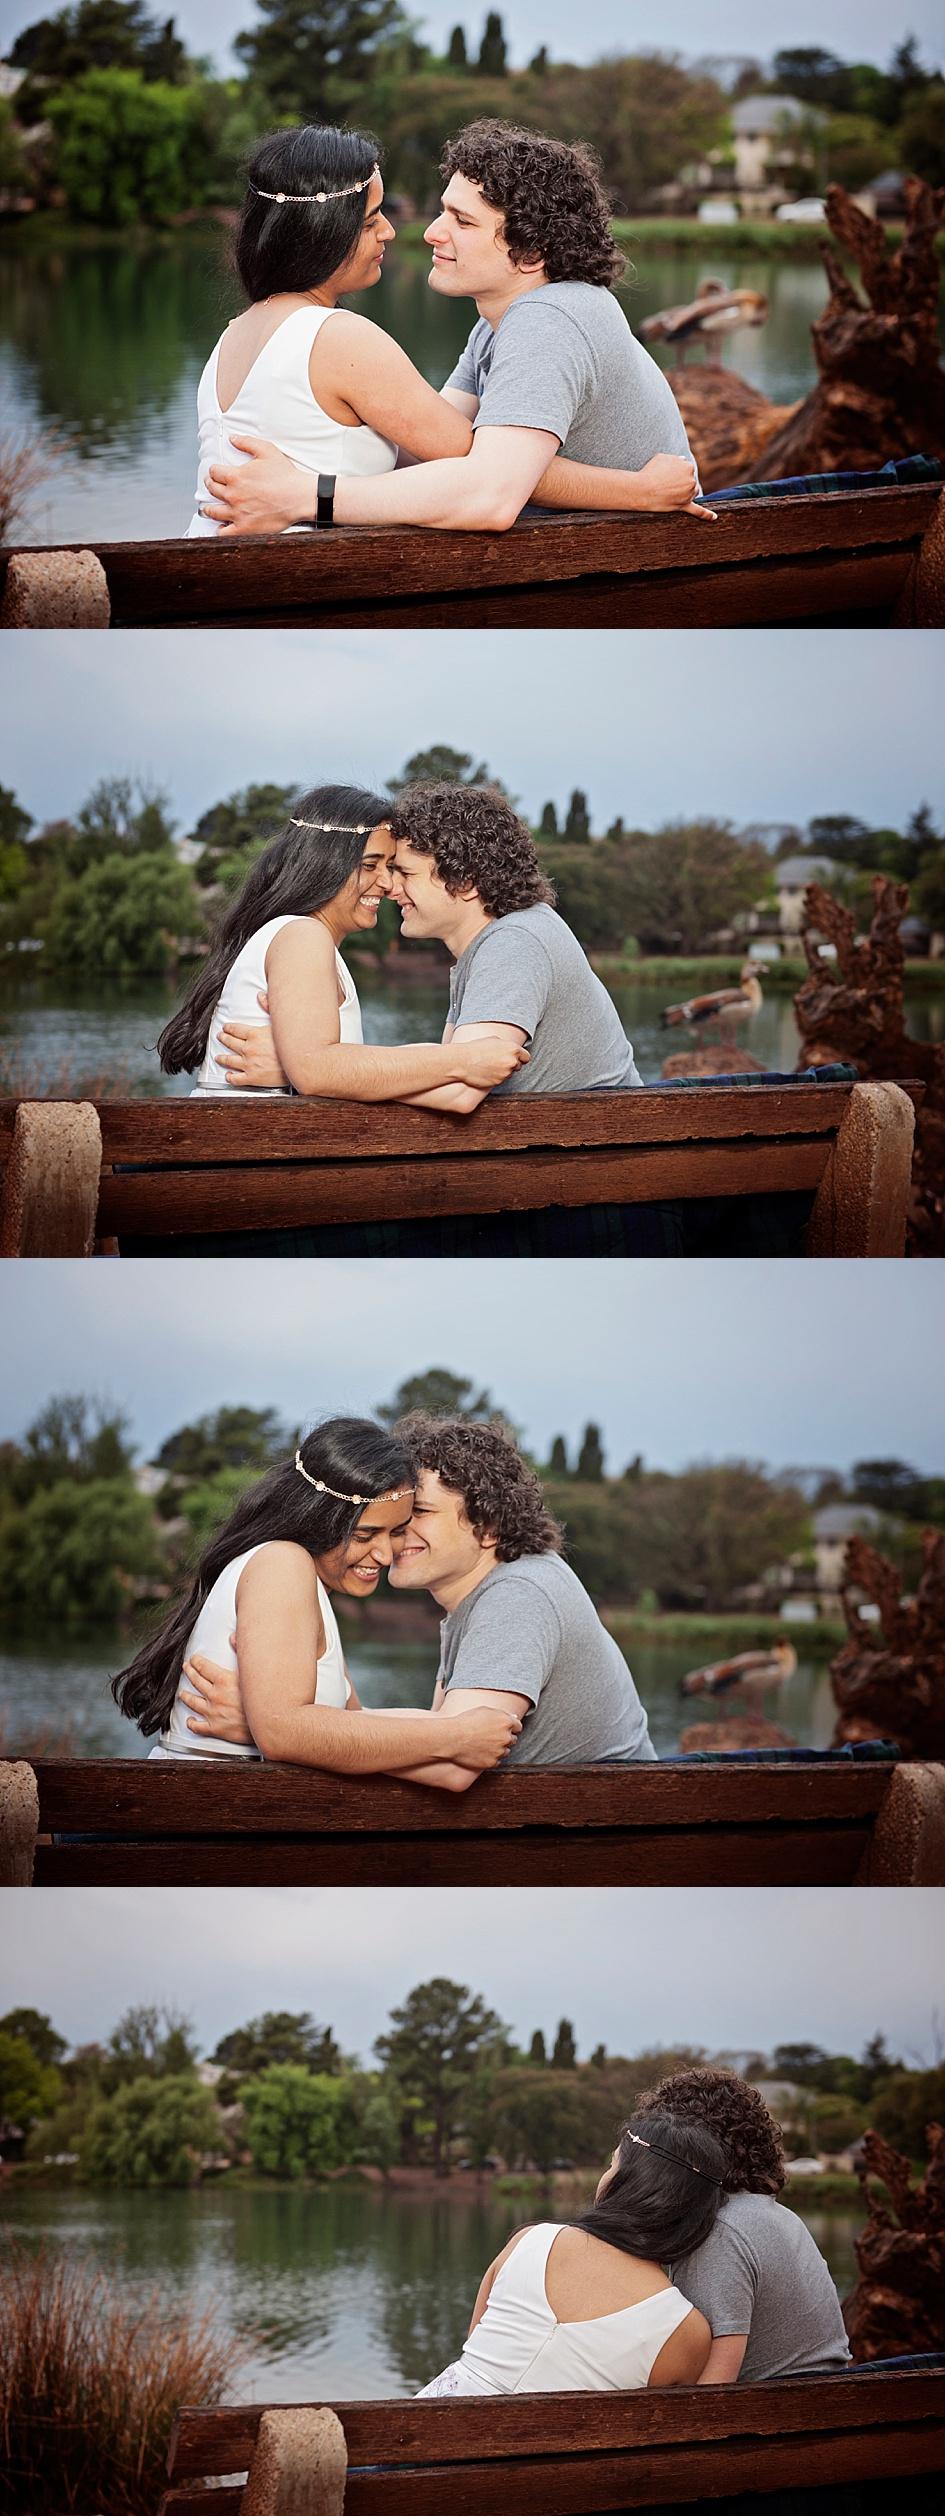 romantic-engagement-shoot-ideas.jpg